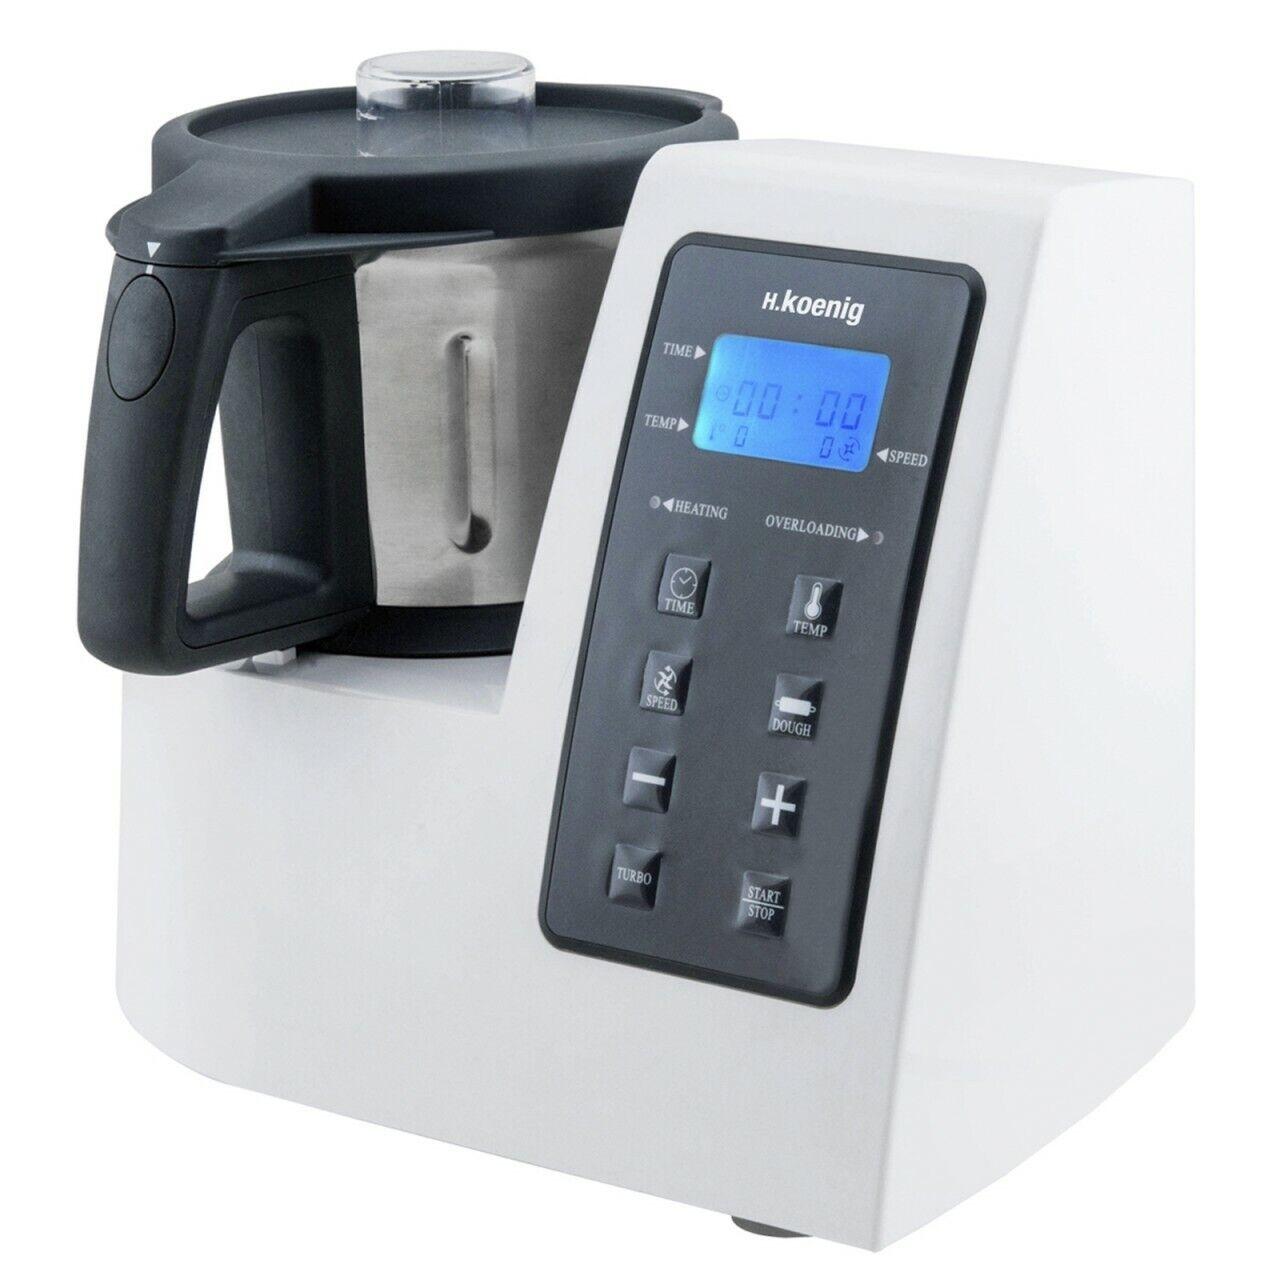 Professional Food Processor Thermo Multi Cooker 9 In1, 2 Liter, 1300watt